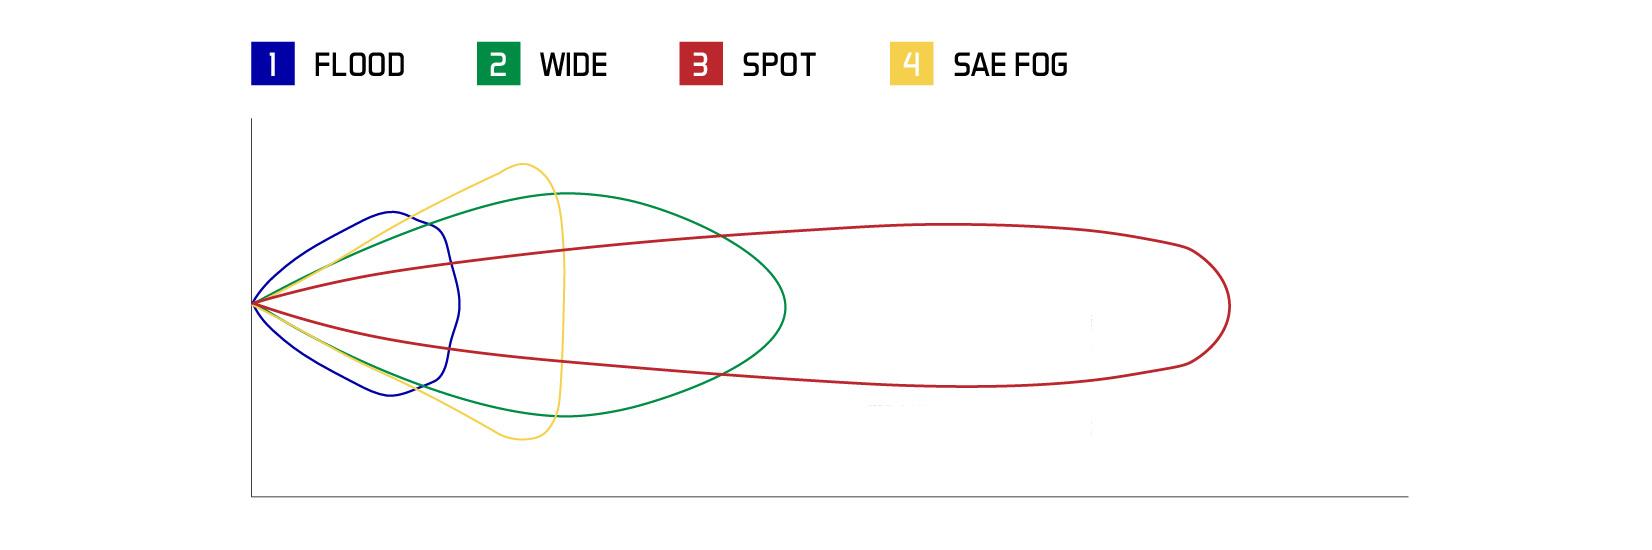 Stage Series C1 Beam Patterns